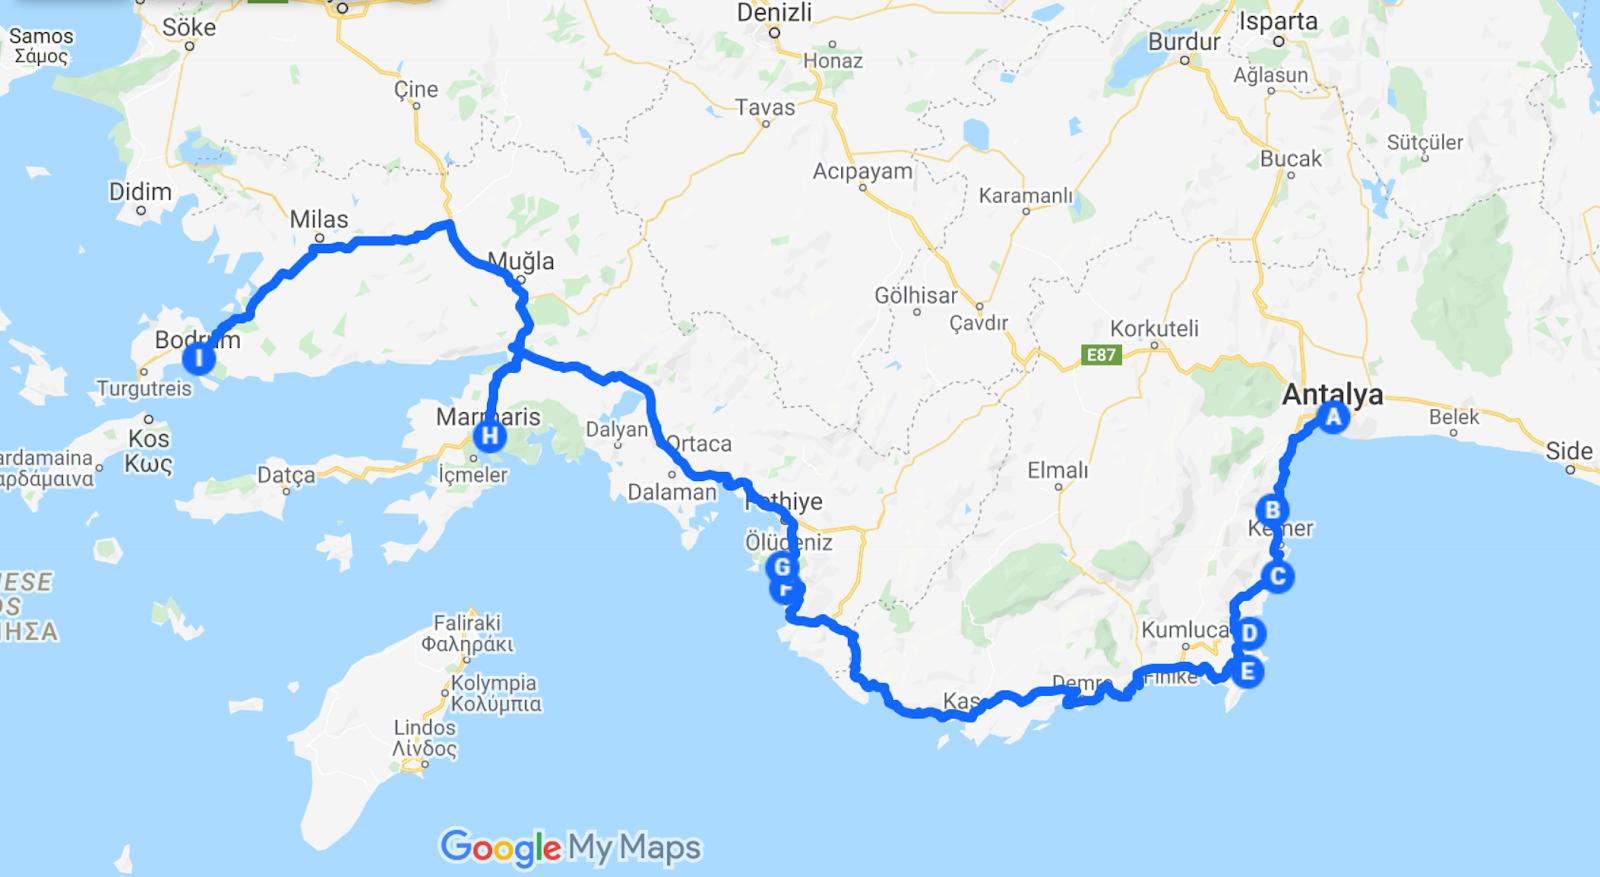 antalya to bodrum turkish riviera road trip itinerary schedule google maps